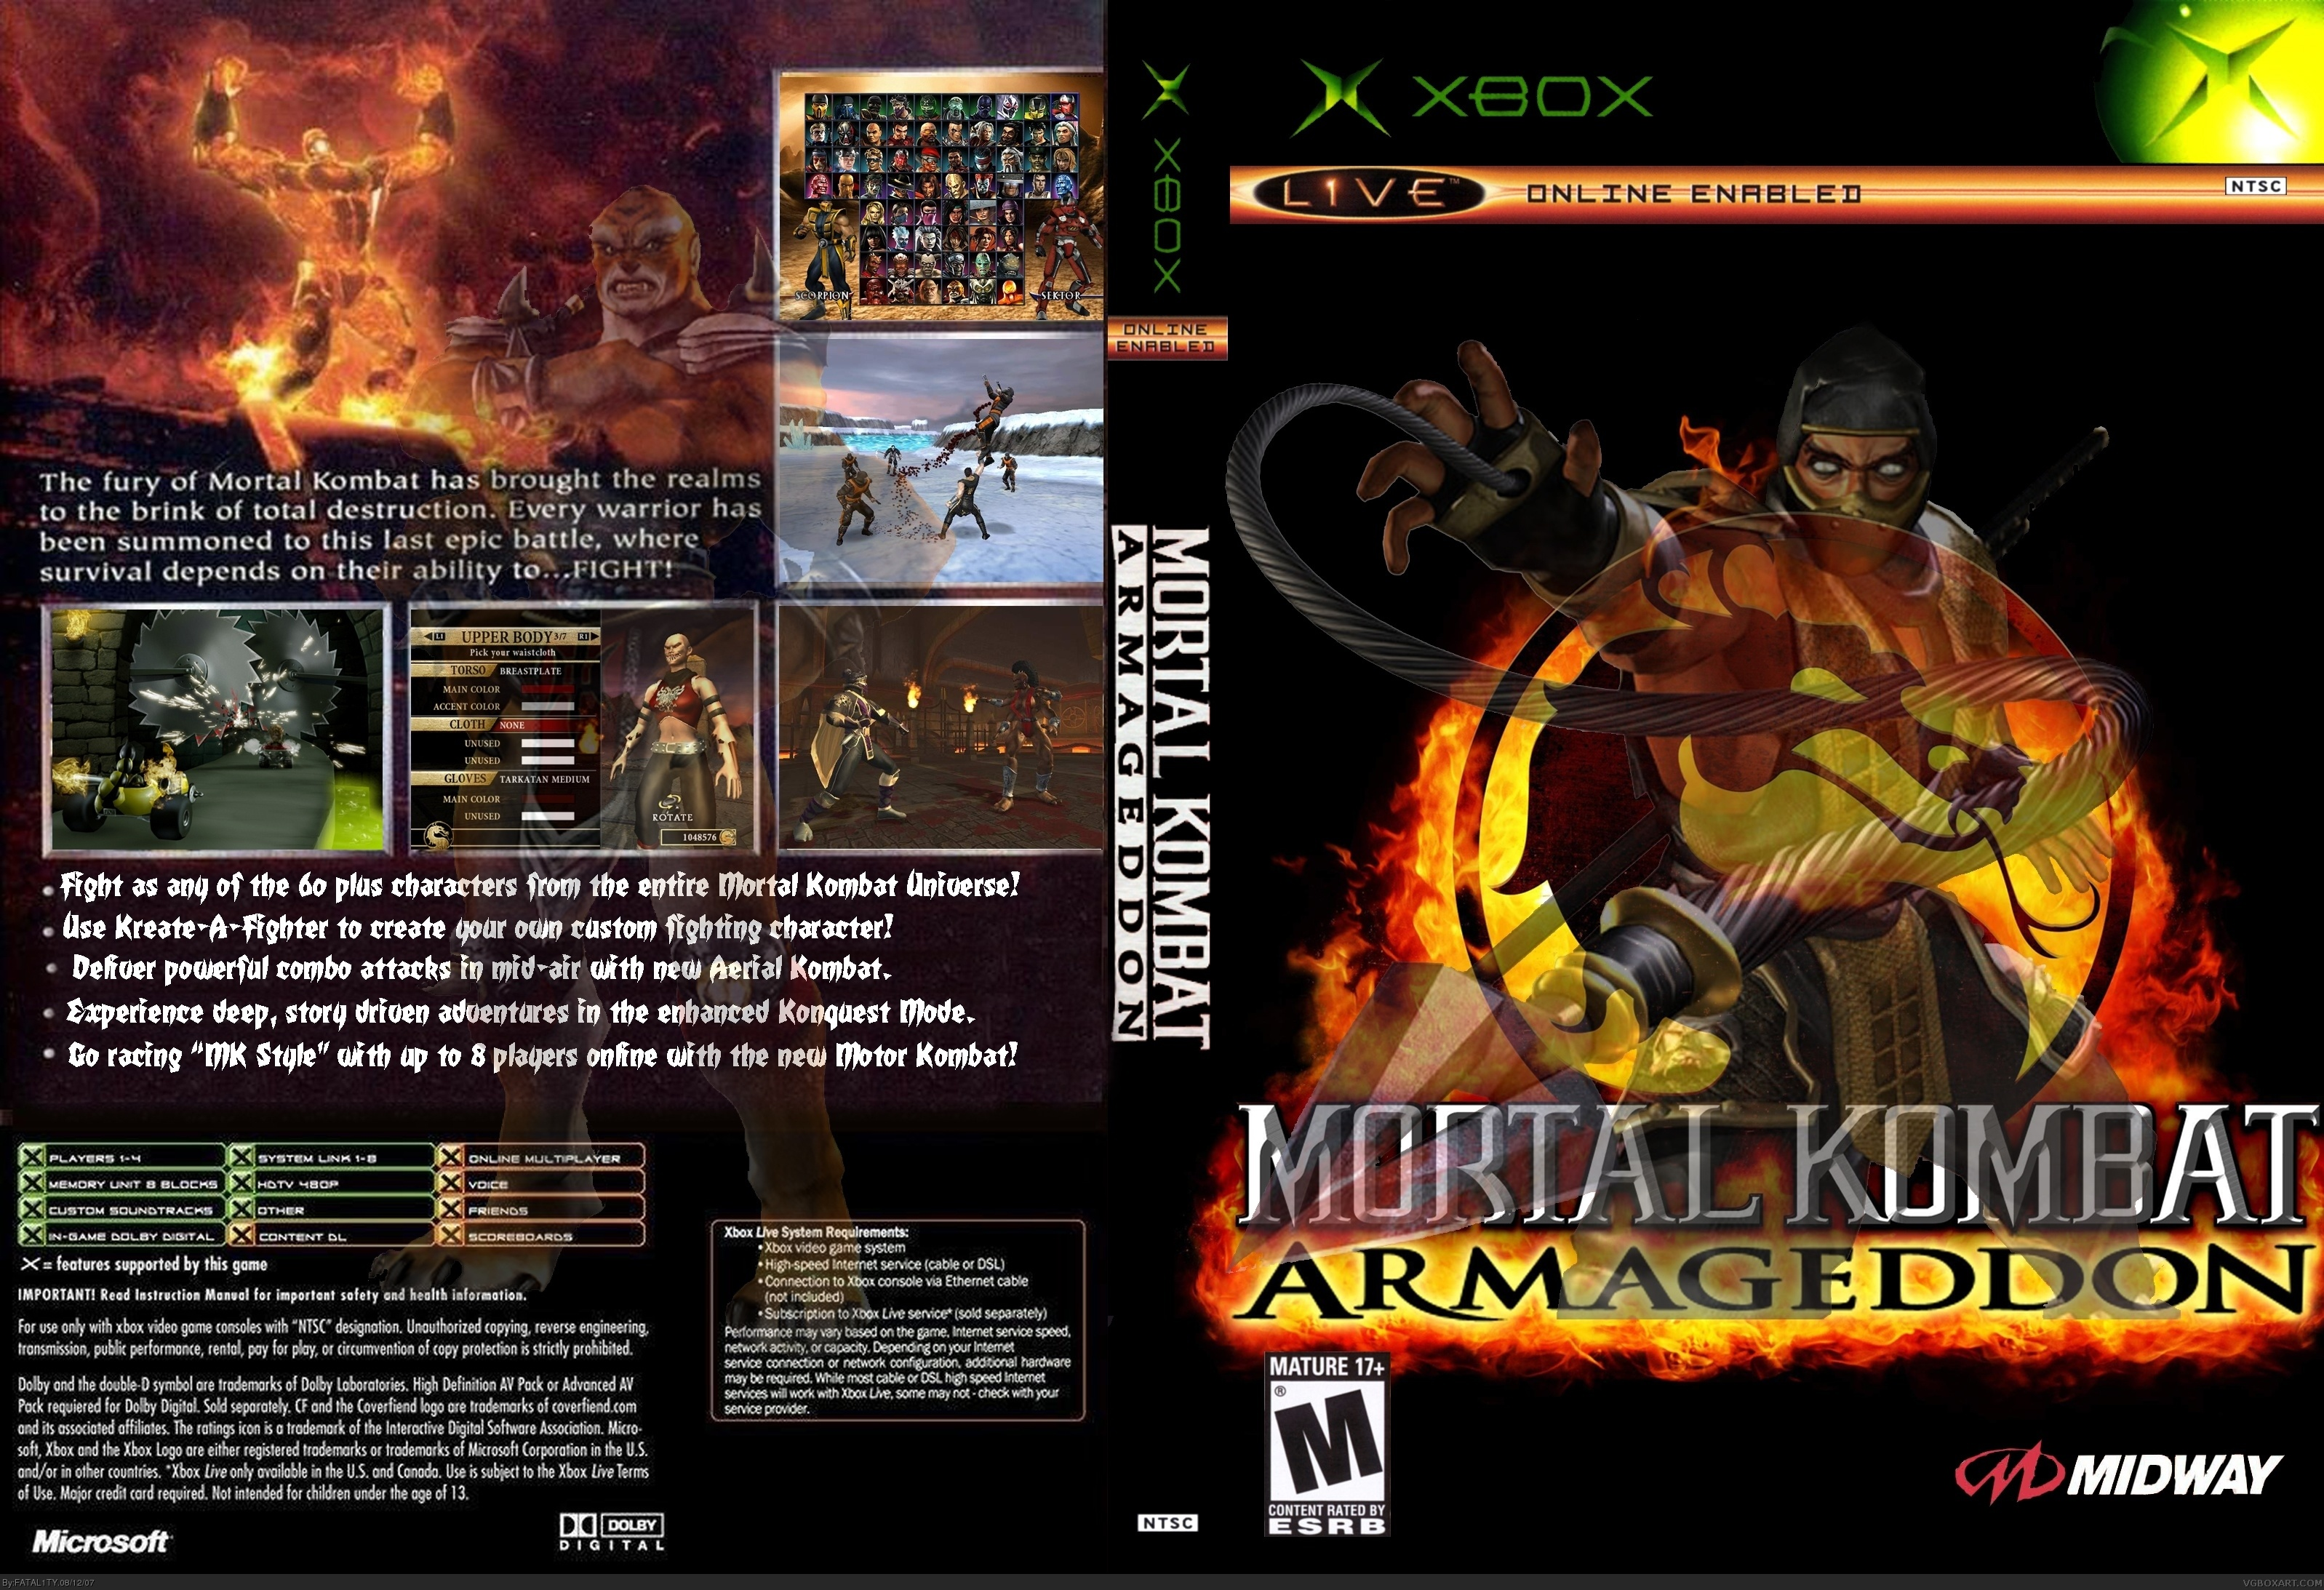 Mortal Kombat Armageddon Xbox Box Art Cover By FATAL1TY